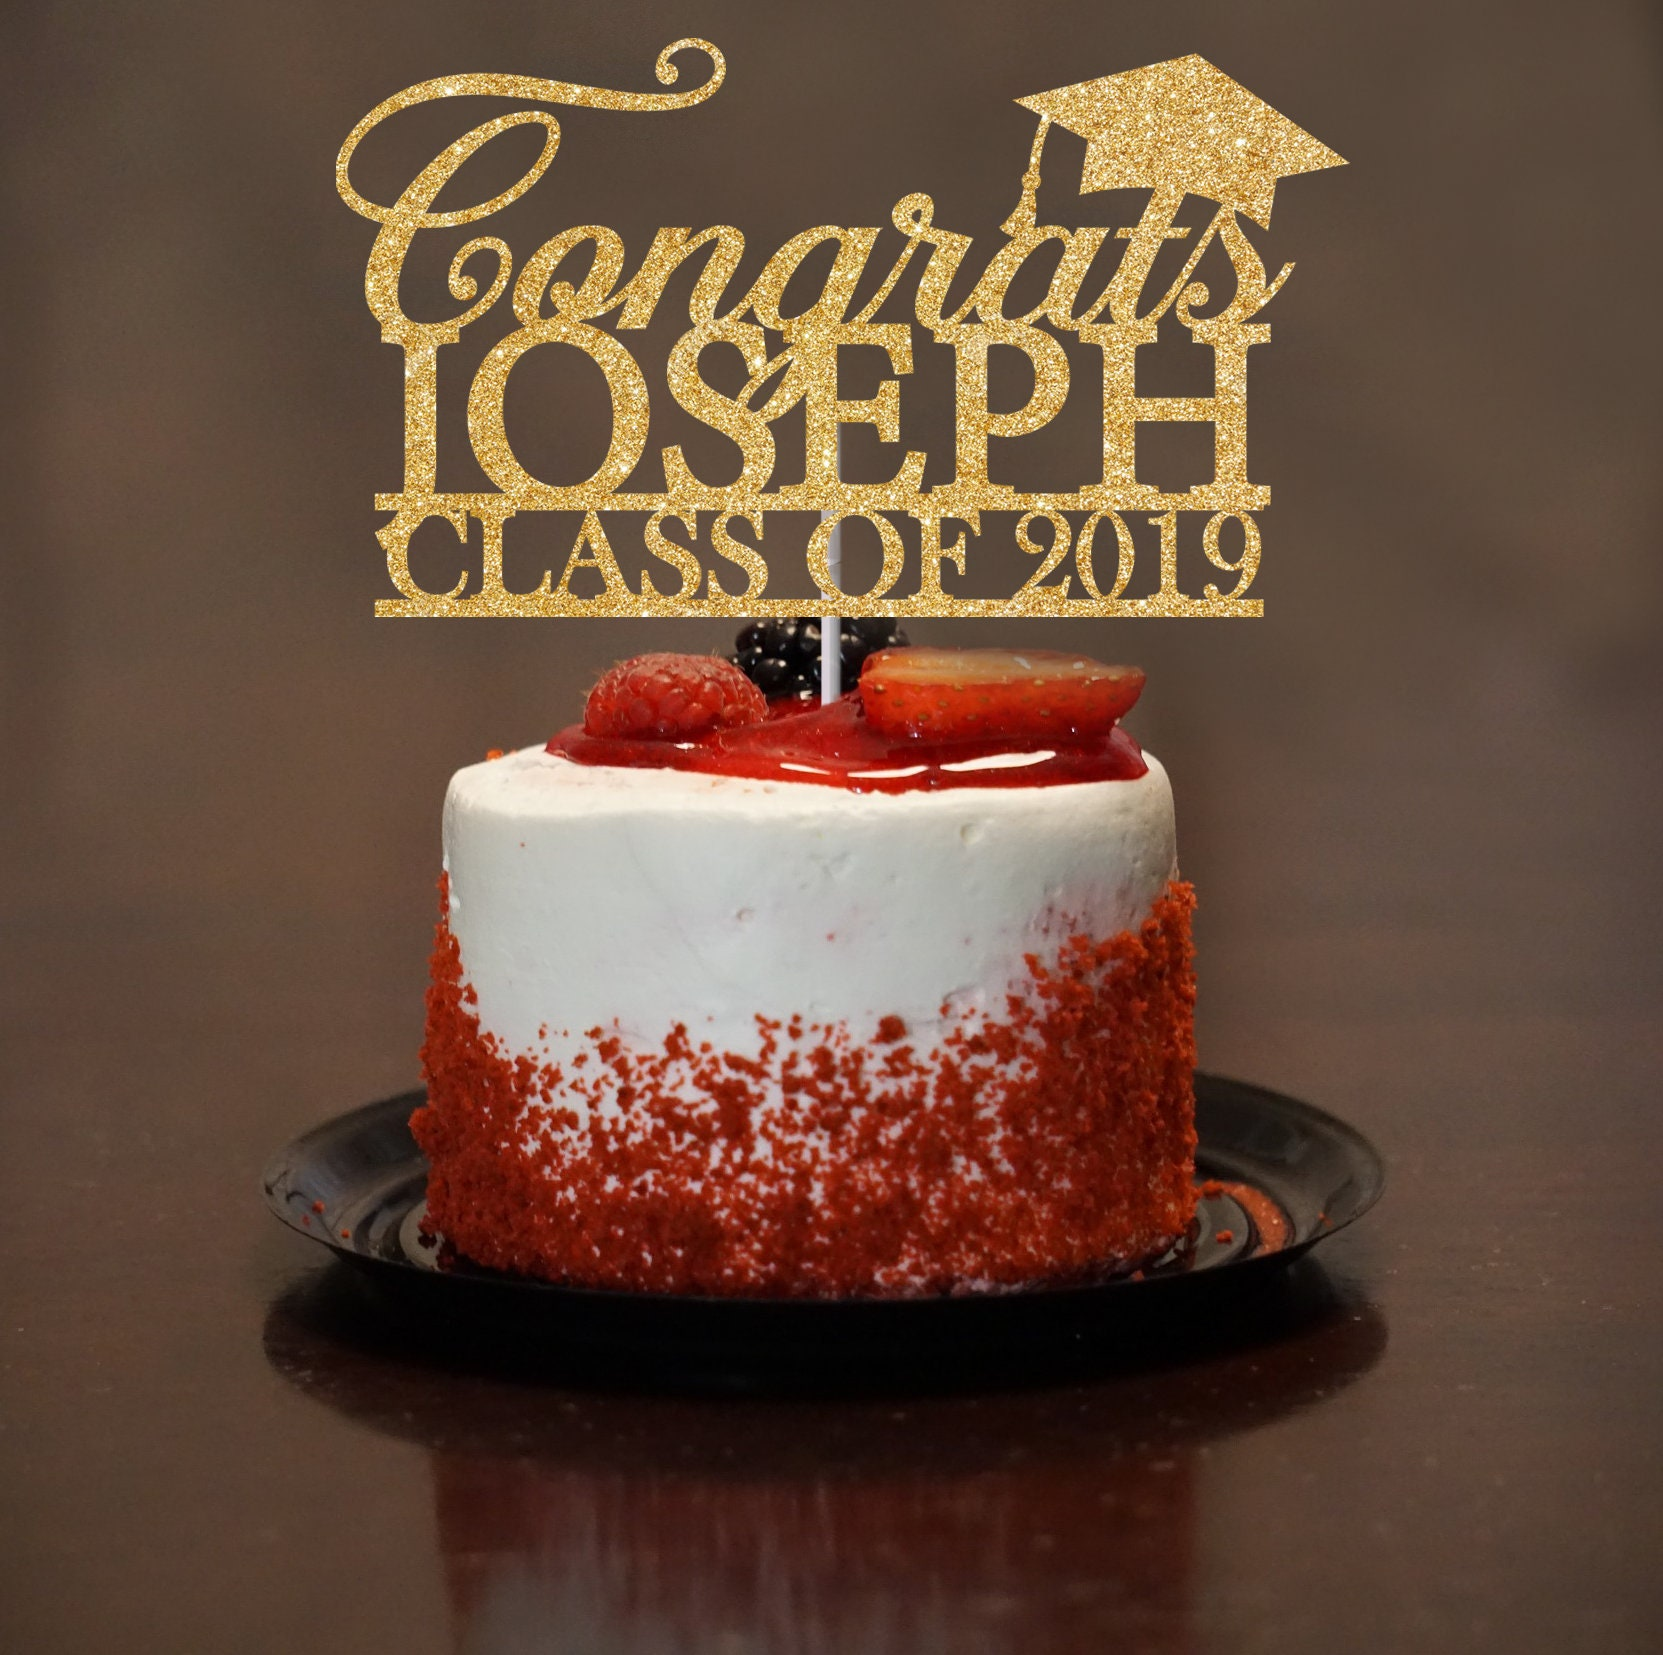 Congrats Grad Cake Topper Black Class Of 2019 Acrylic Cake Picks Cake Topper MC